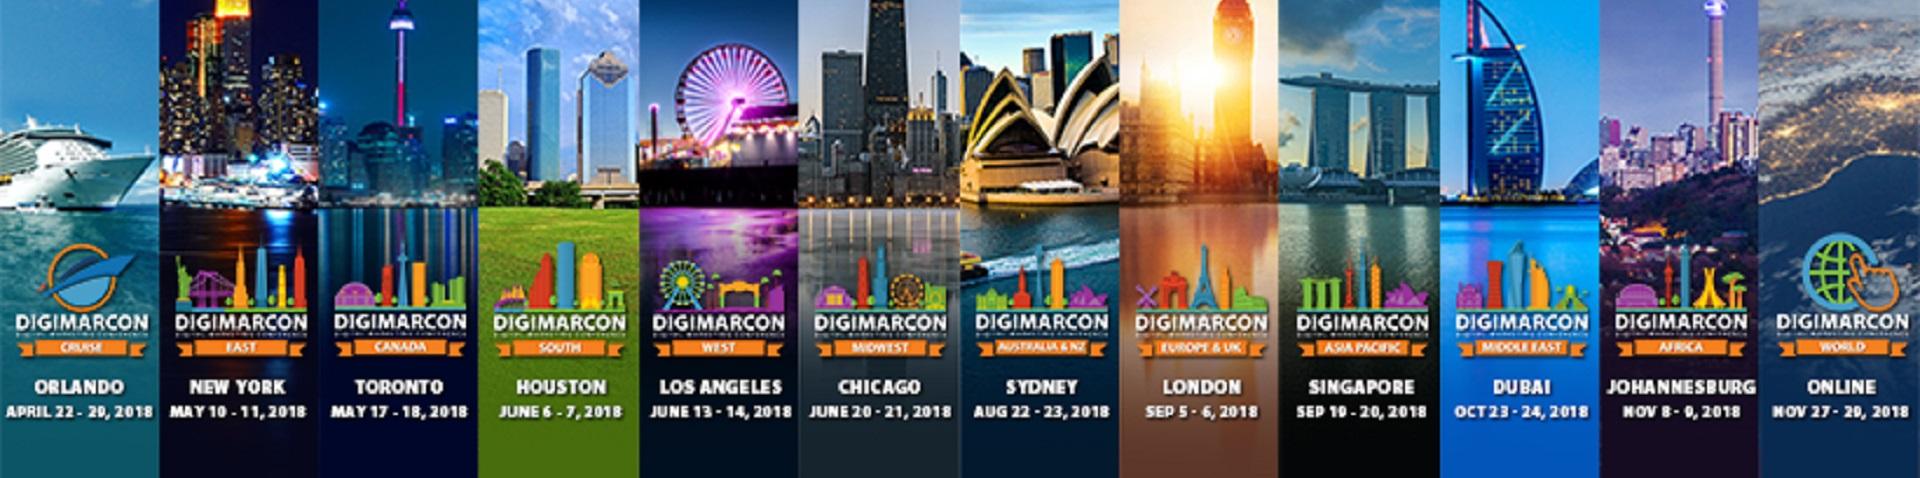 DigiMarCon Europe